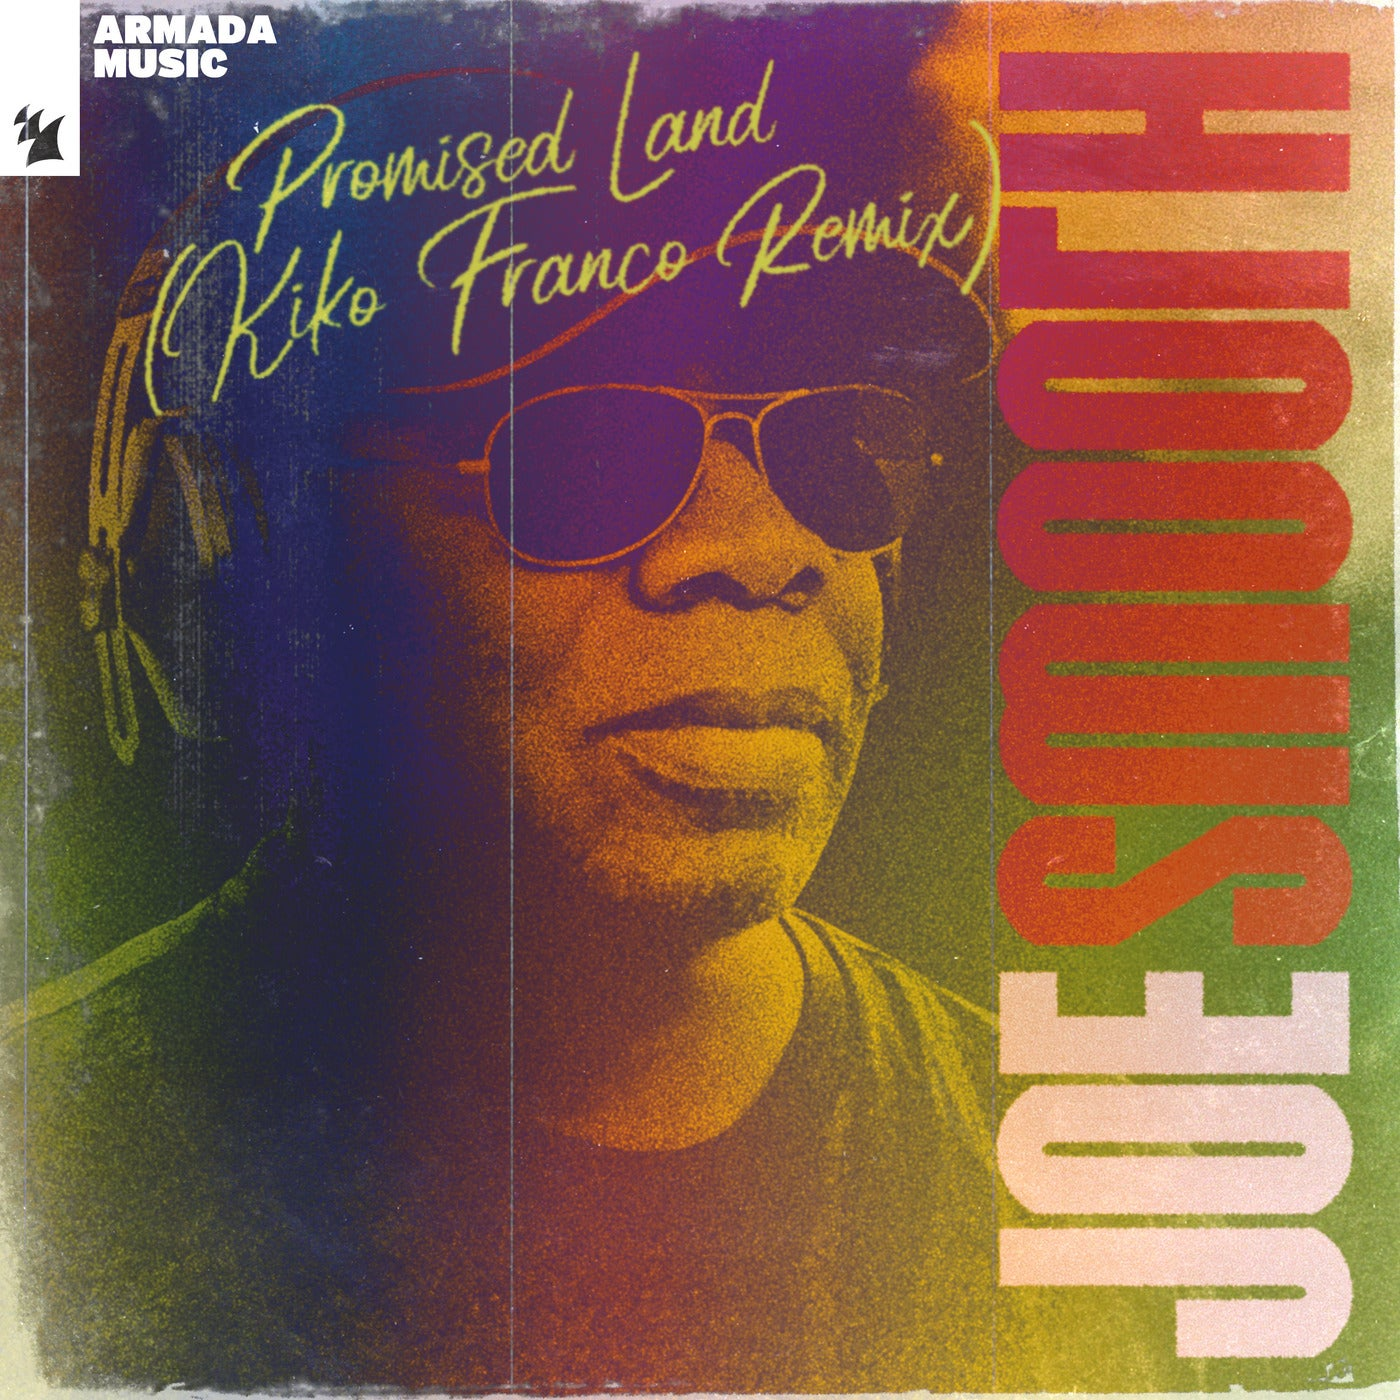 Promised Land (Kiko Franco Extended Remix)